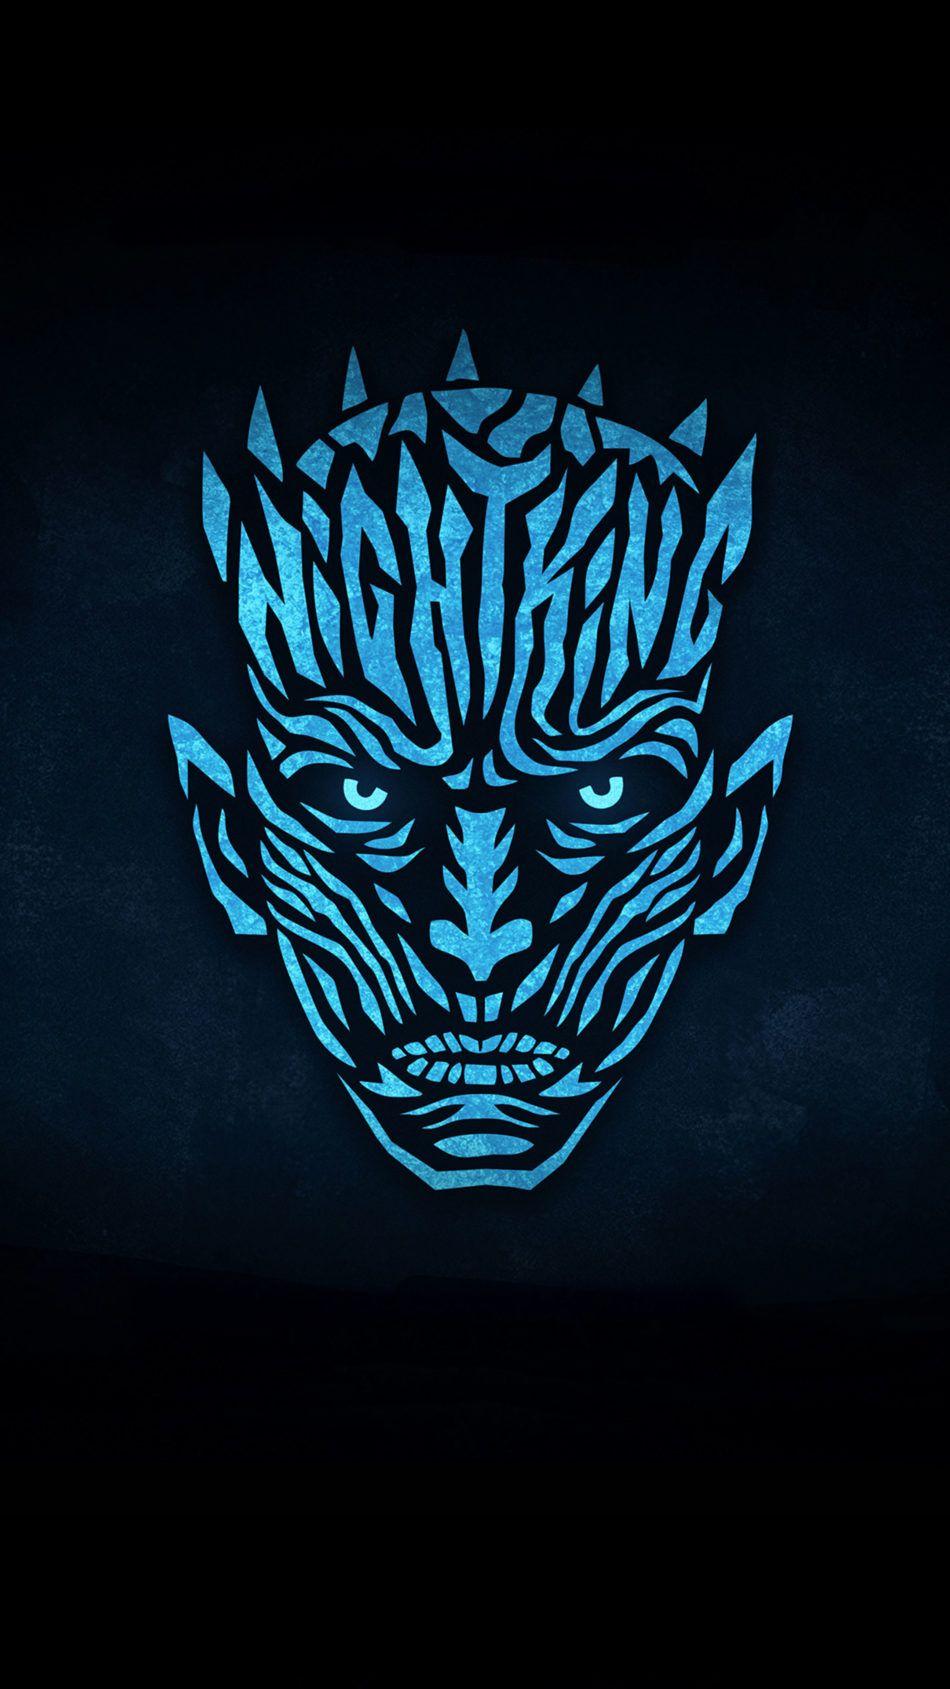 Night King Minimal 4k Ultra Hd Mobile Wallpaper In 2020 Night King Game Of Thrones Art Minimalist Wallpaper